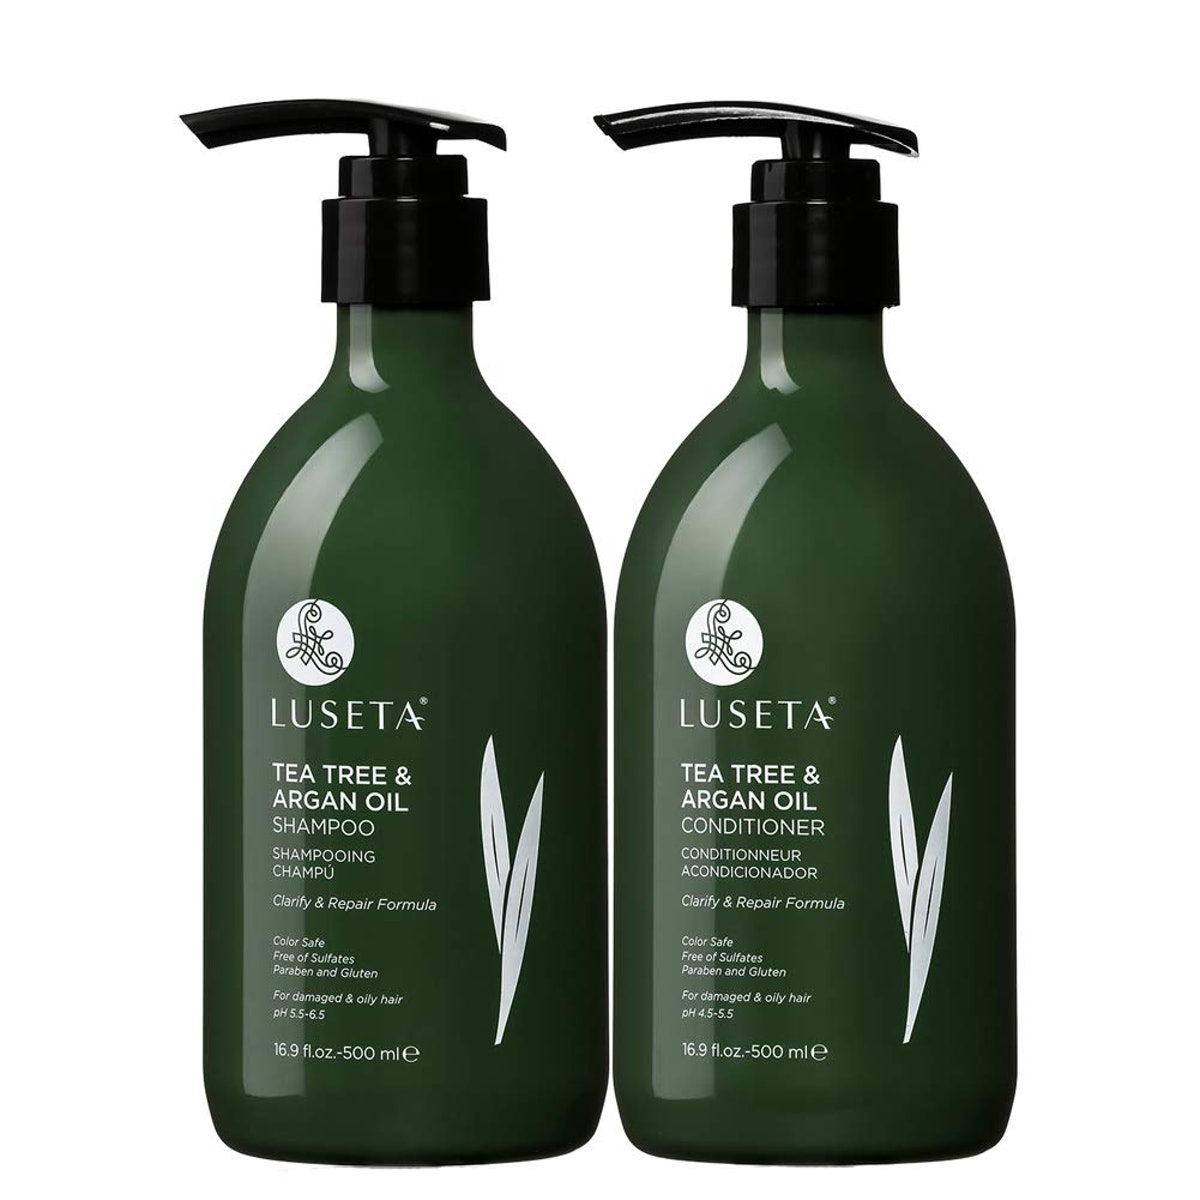 Luseta Tea Tree & Argan Oil Shampoo & Conditioner Set, 16.9 oz